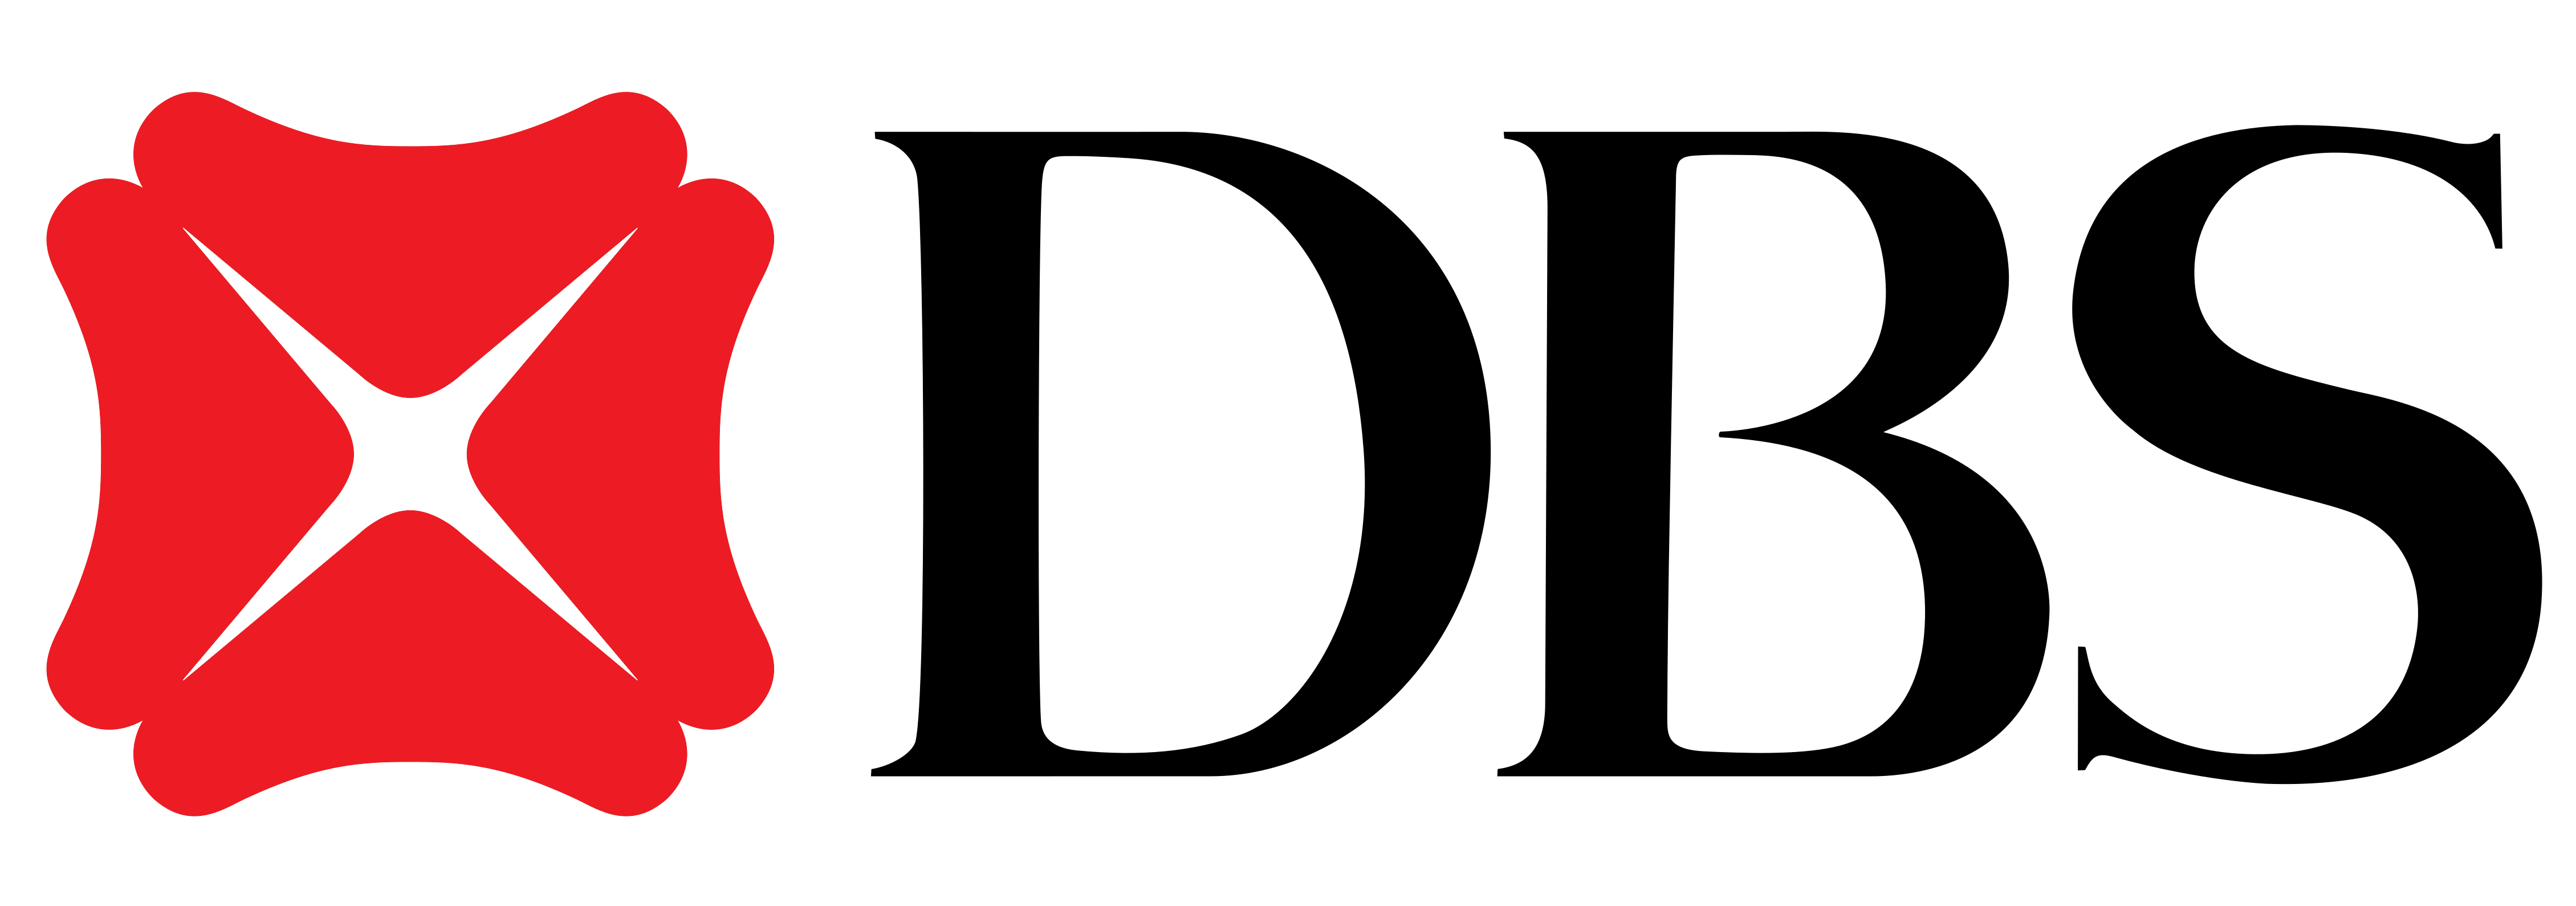 Dbs Logo Vector PNG - 38163